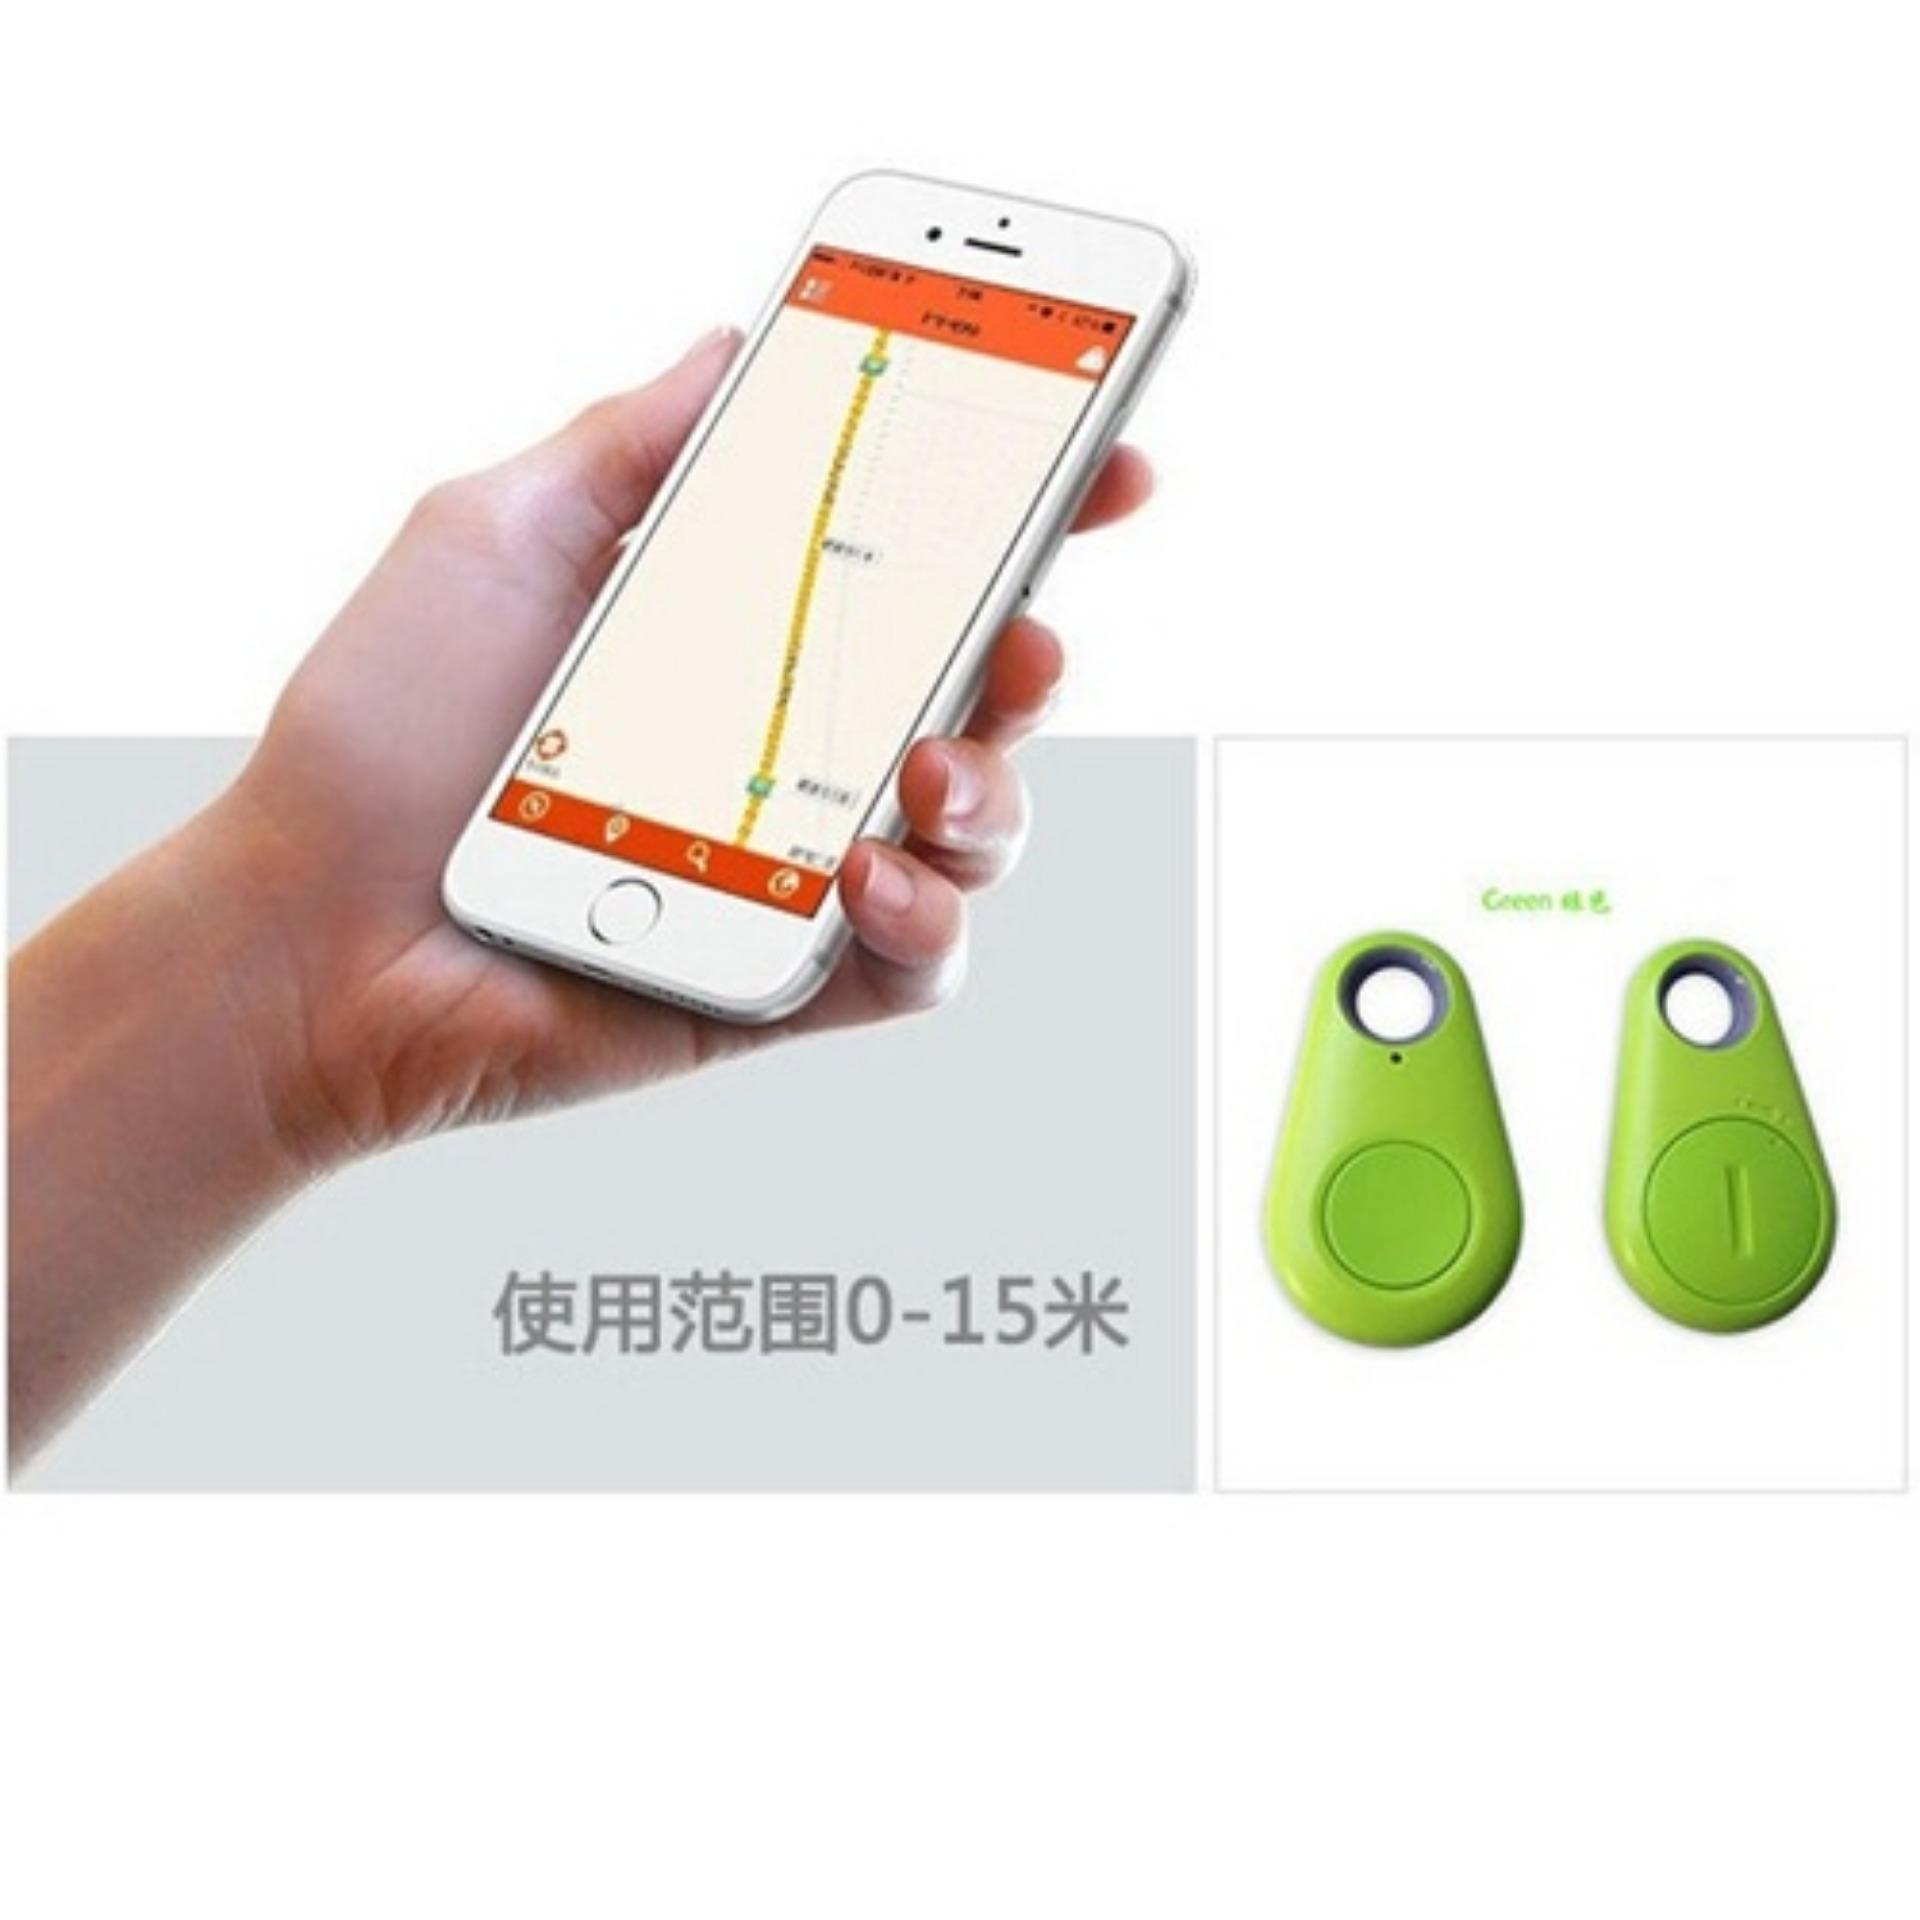 iTag Smart Bluetooth Tracker Wireless Remote Shutter - Black ...